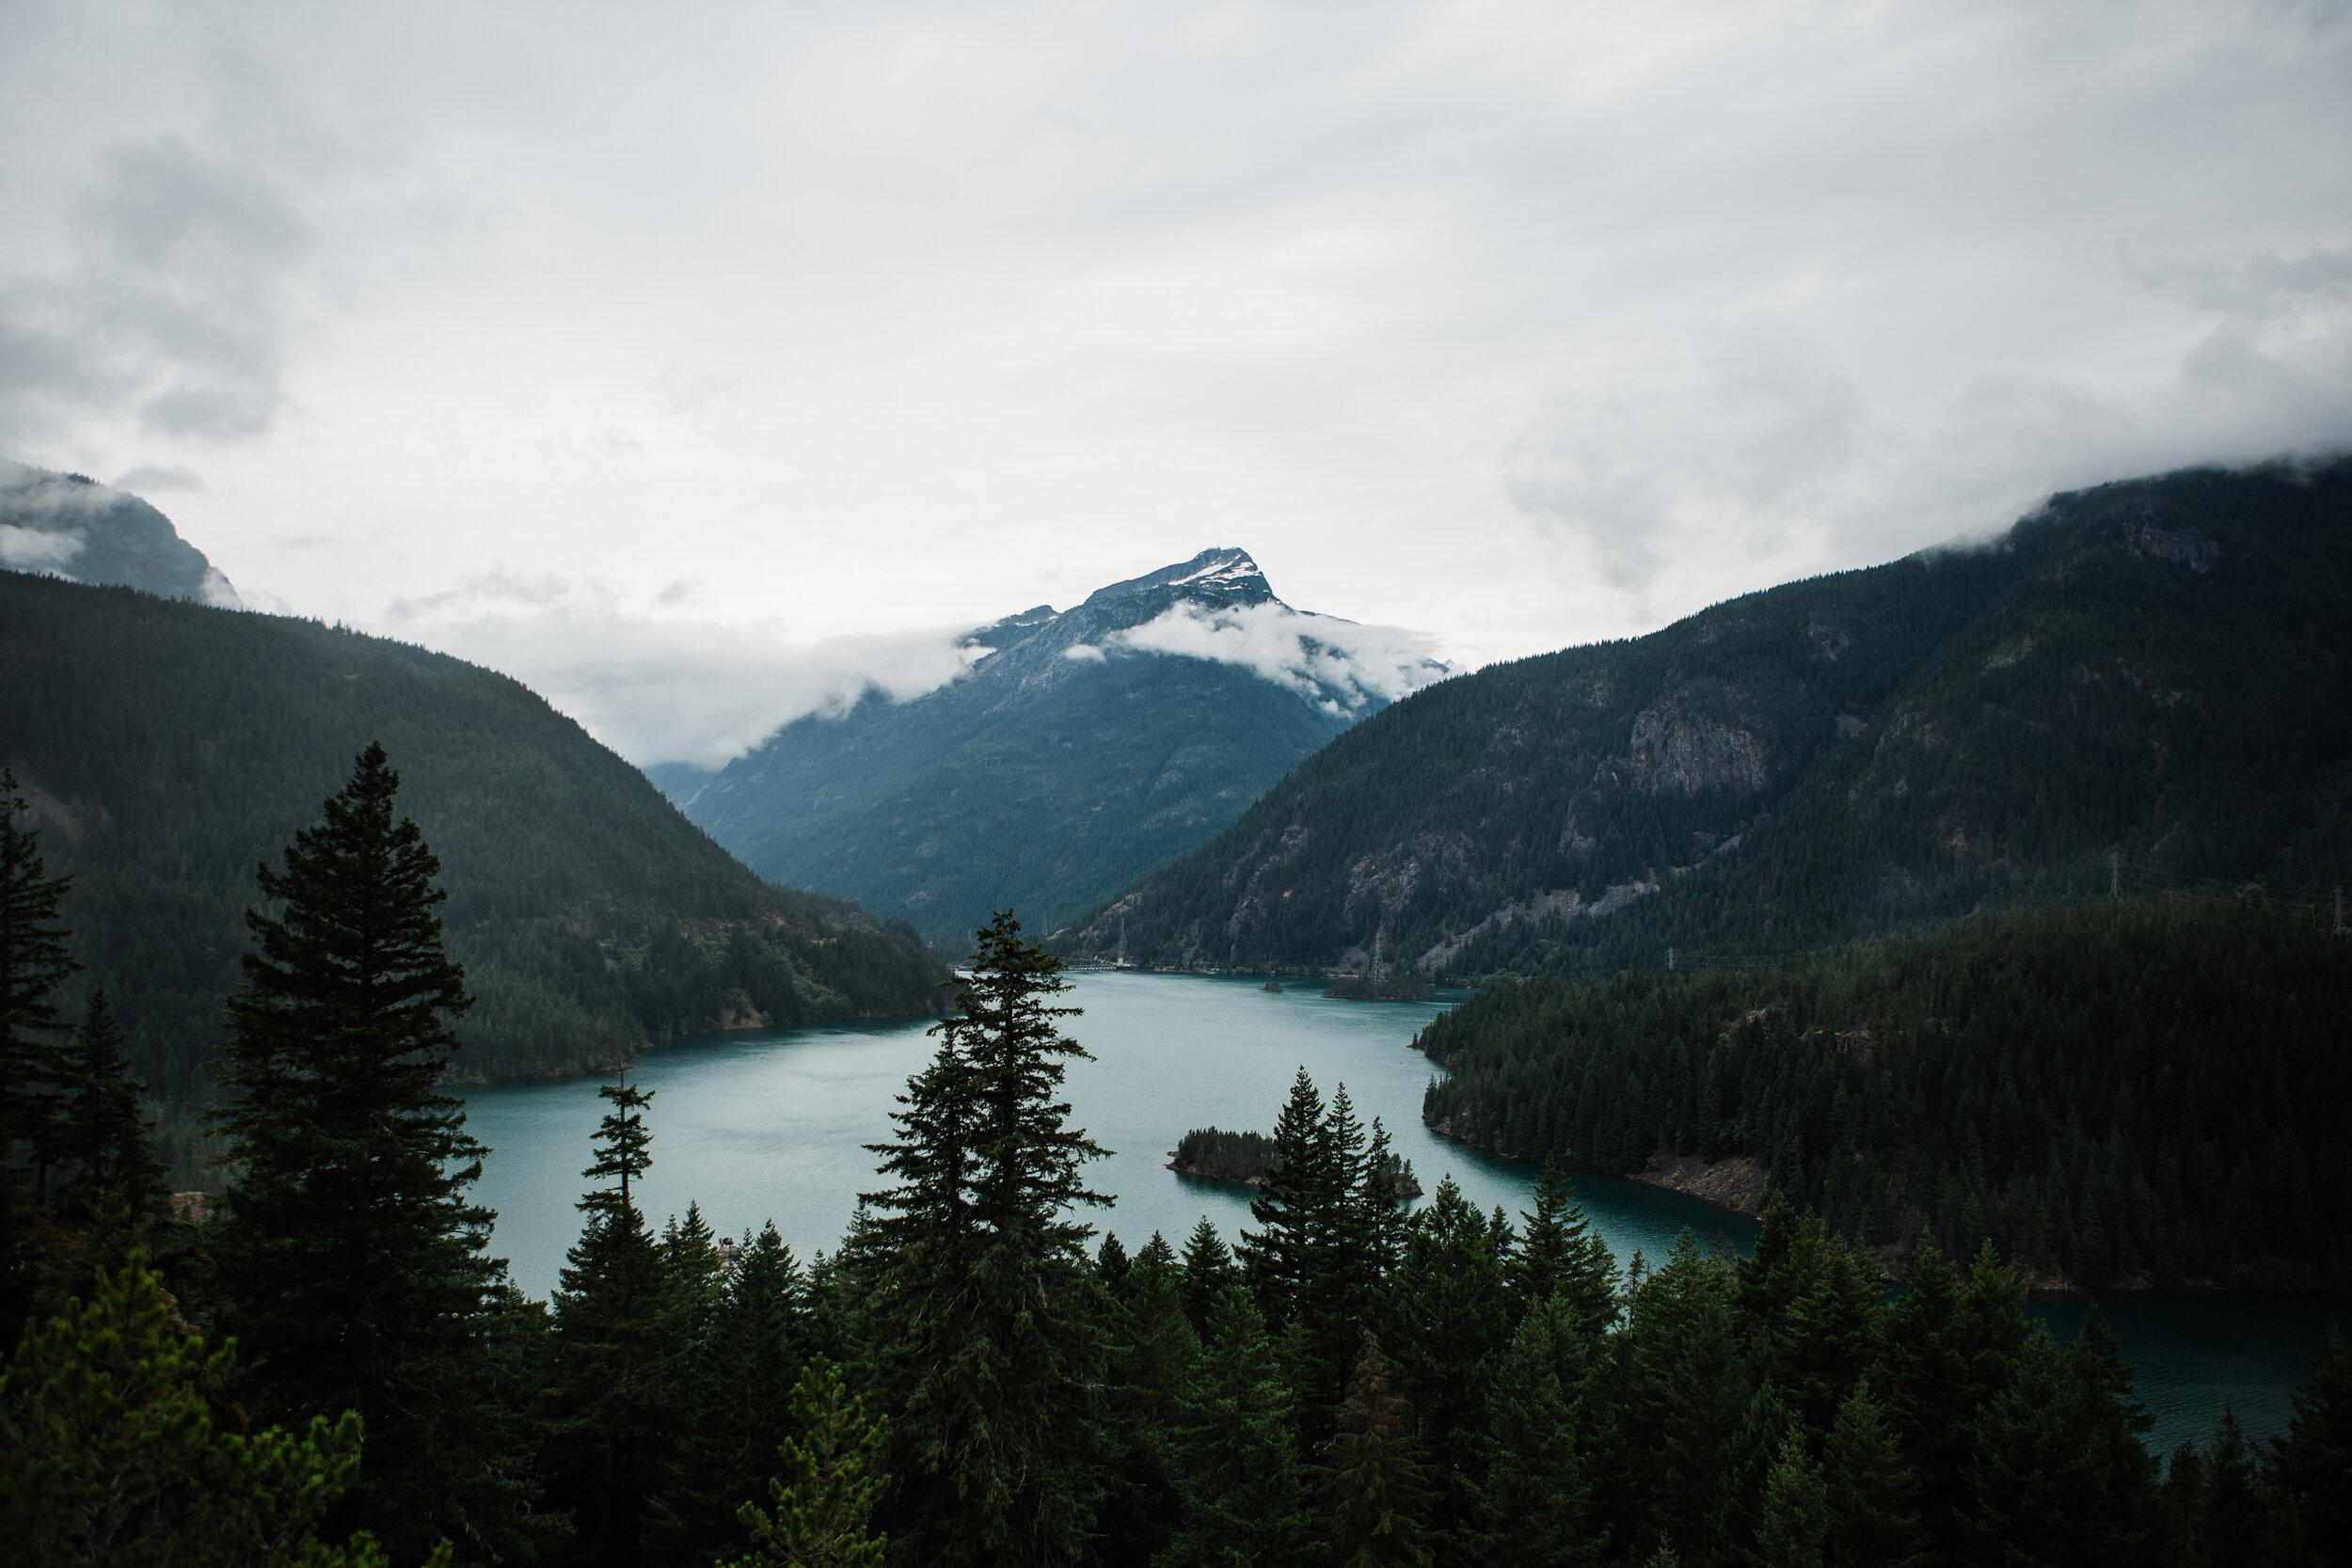 CindyGiovagnoli_North_Cascades_Washington_Nation_Park_camping_outdoors-004.jpg